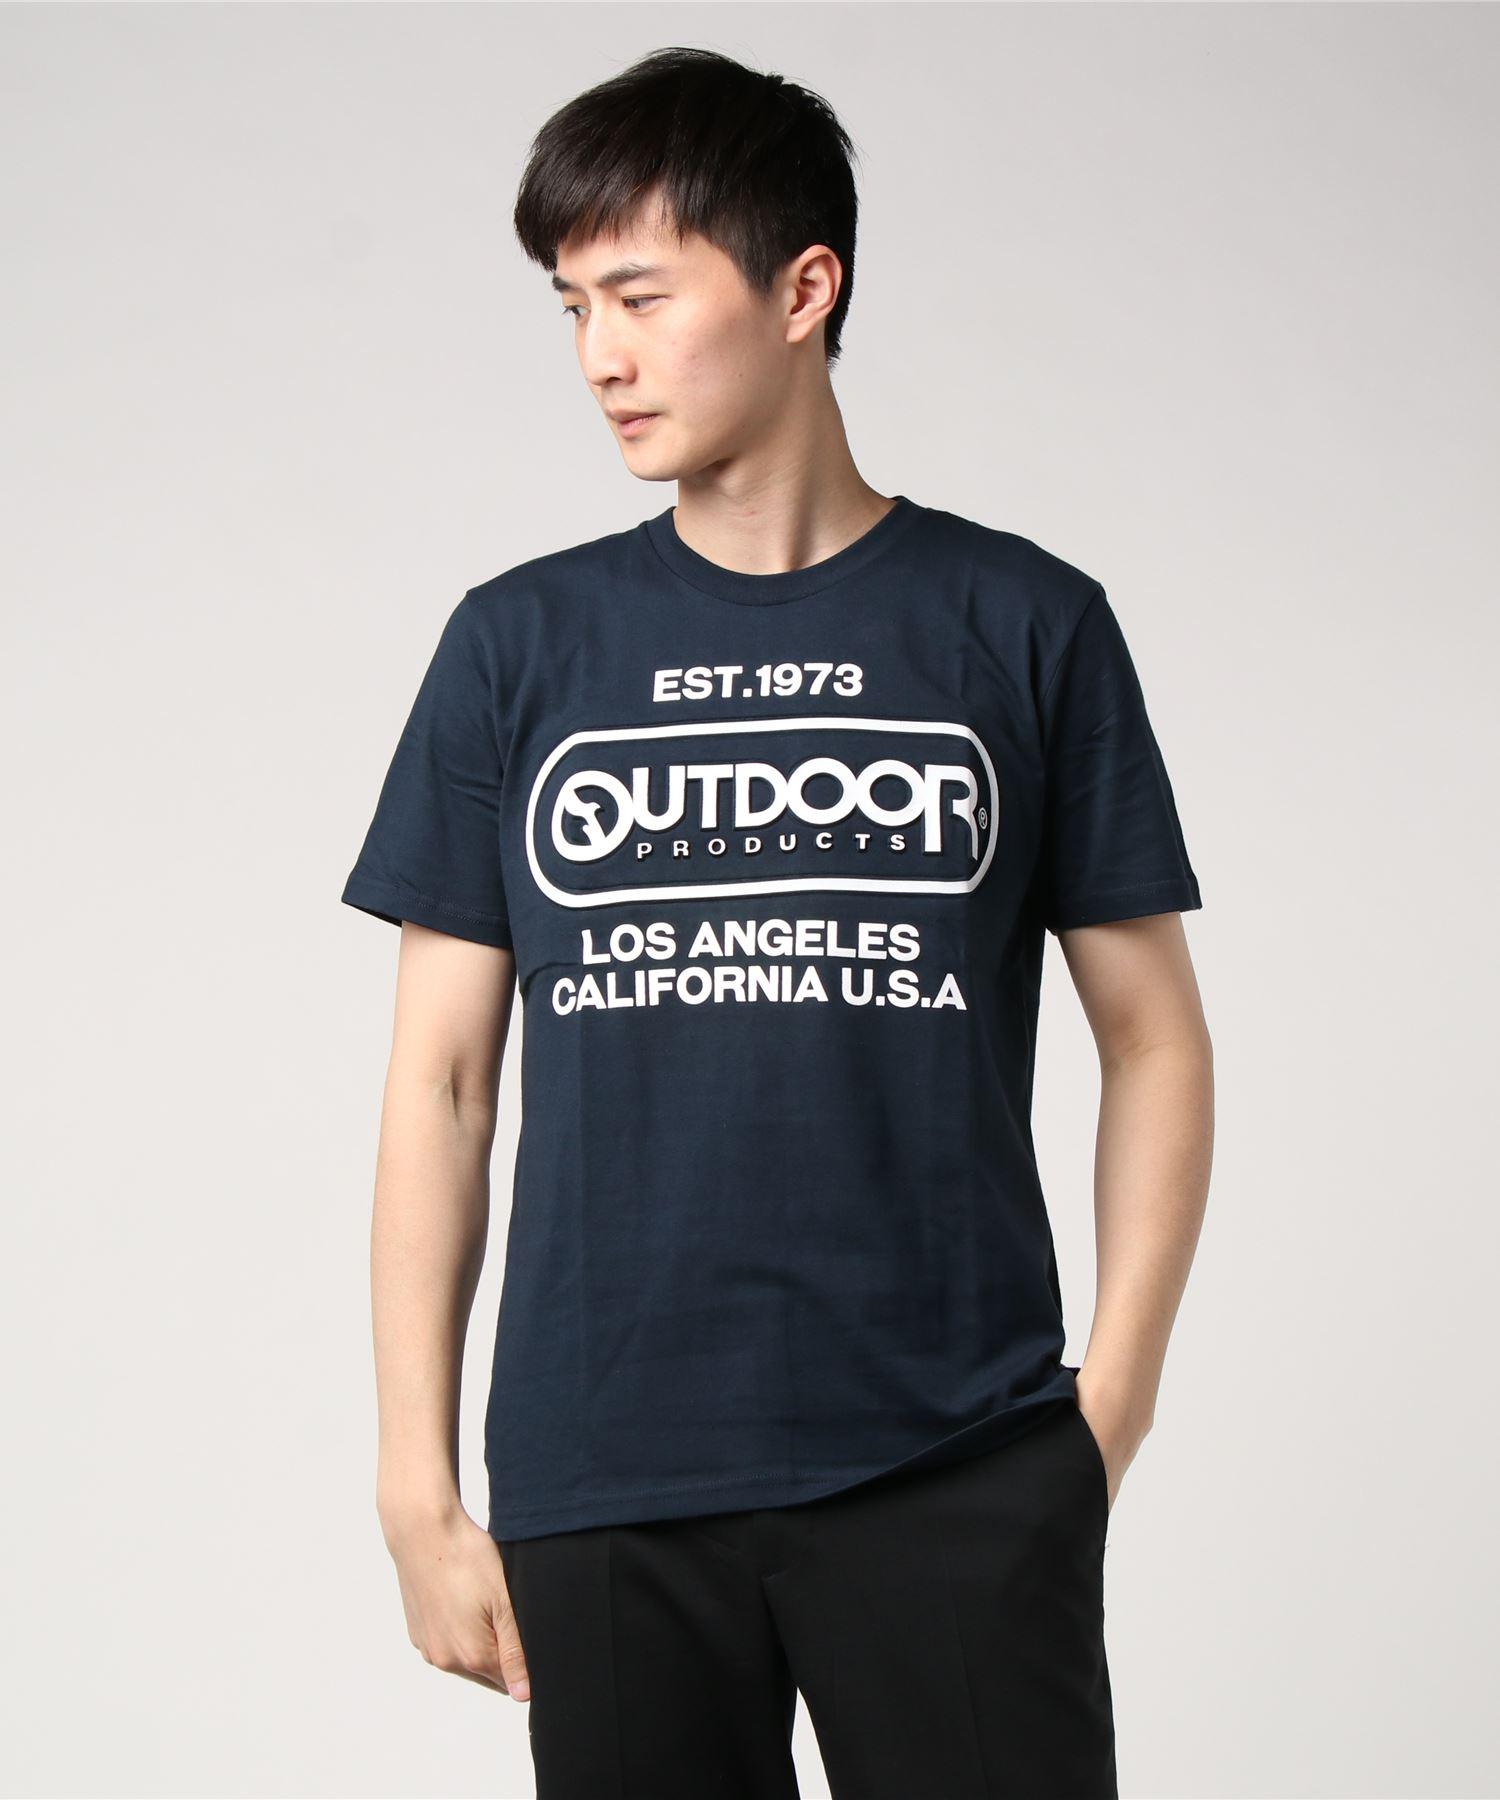 【OUTDOOR PRODUCTS】エンボスプリントロゴTシャツ ブランドロゴ ビッグロゴプリント